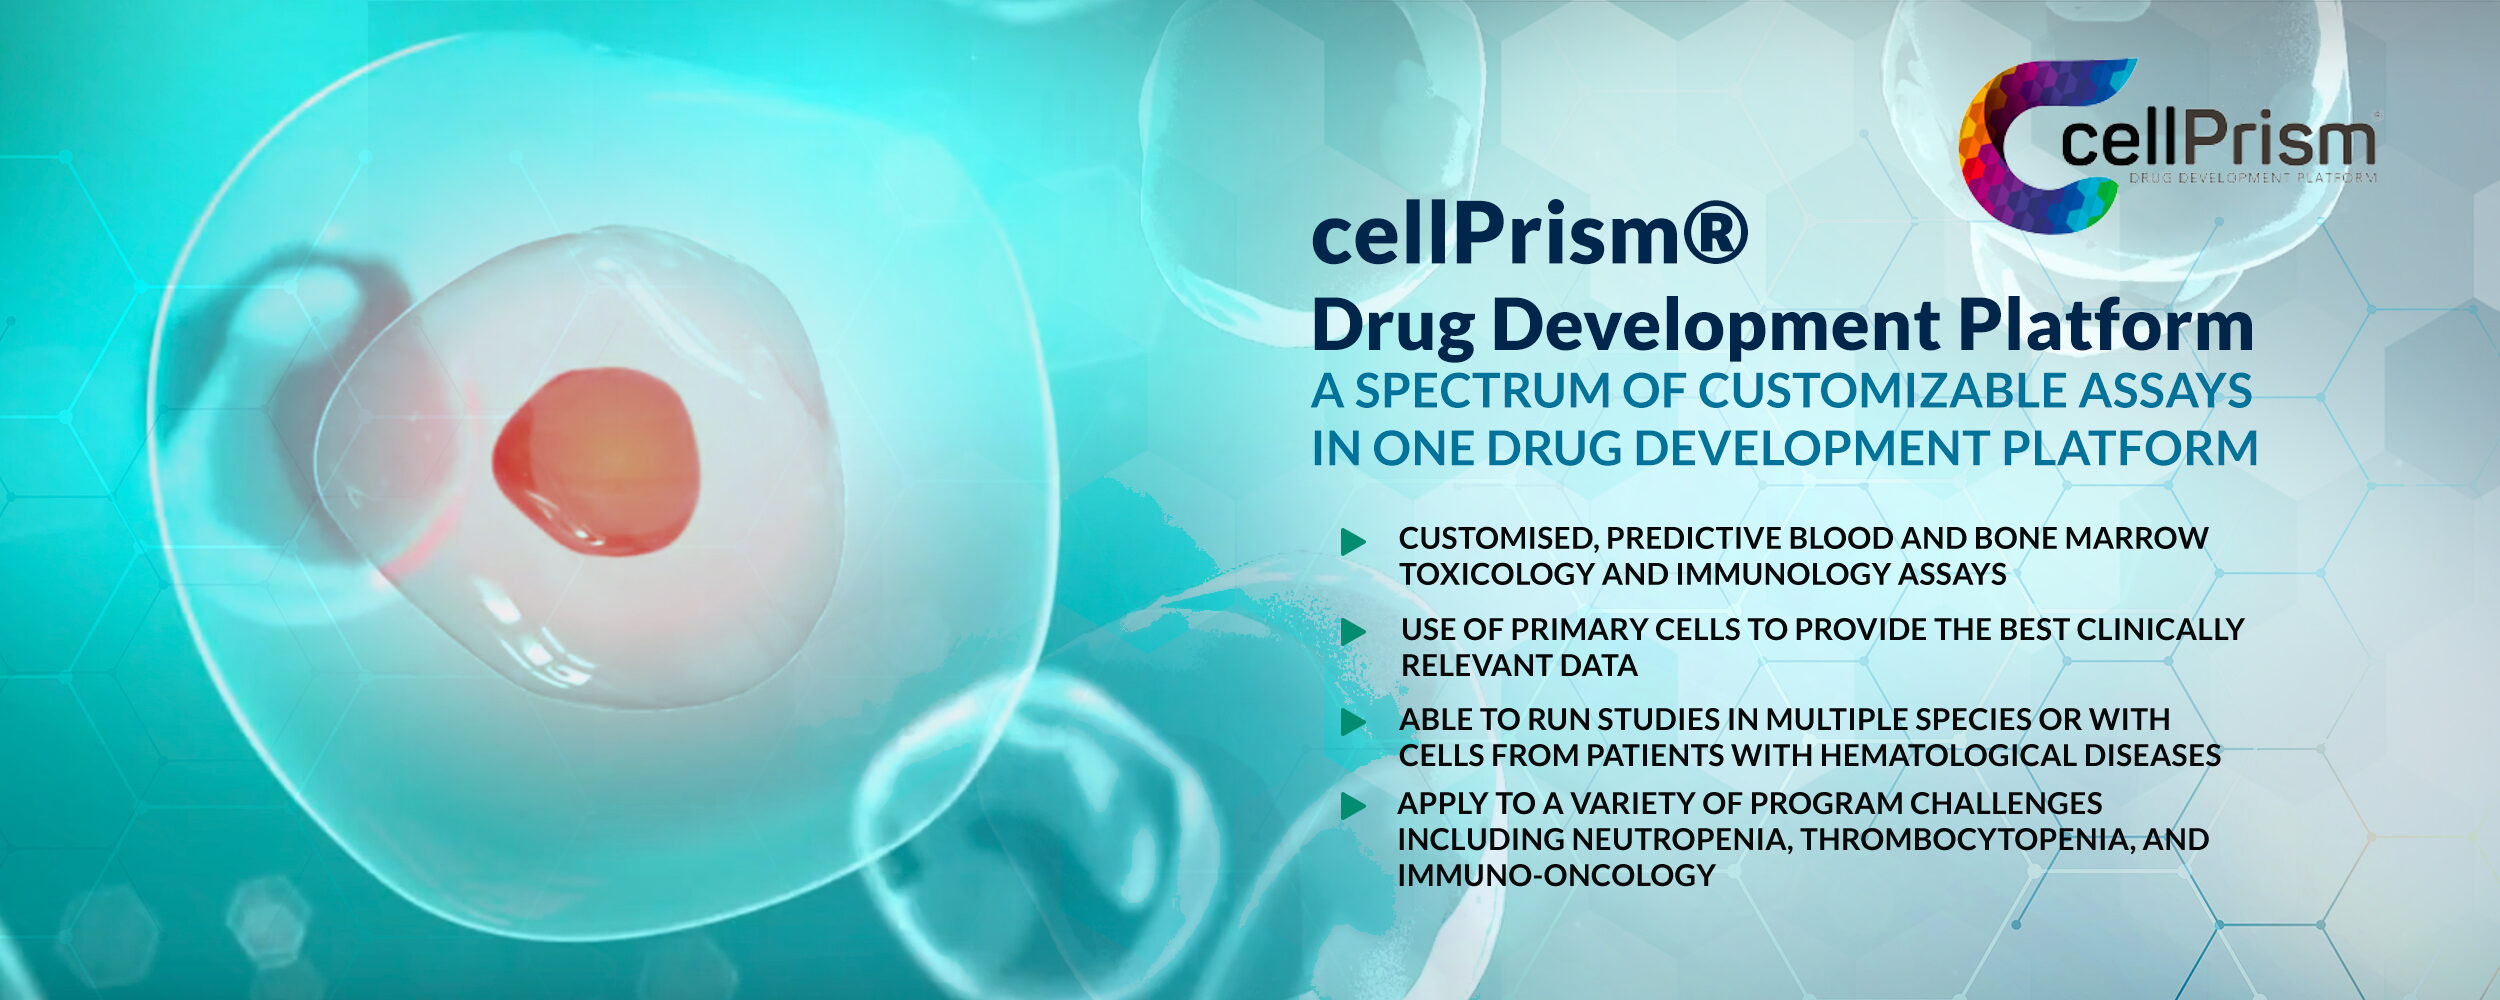 A Spectrum of Customizable Assays in one Drug Development Platform